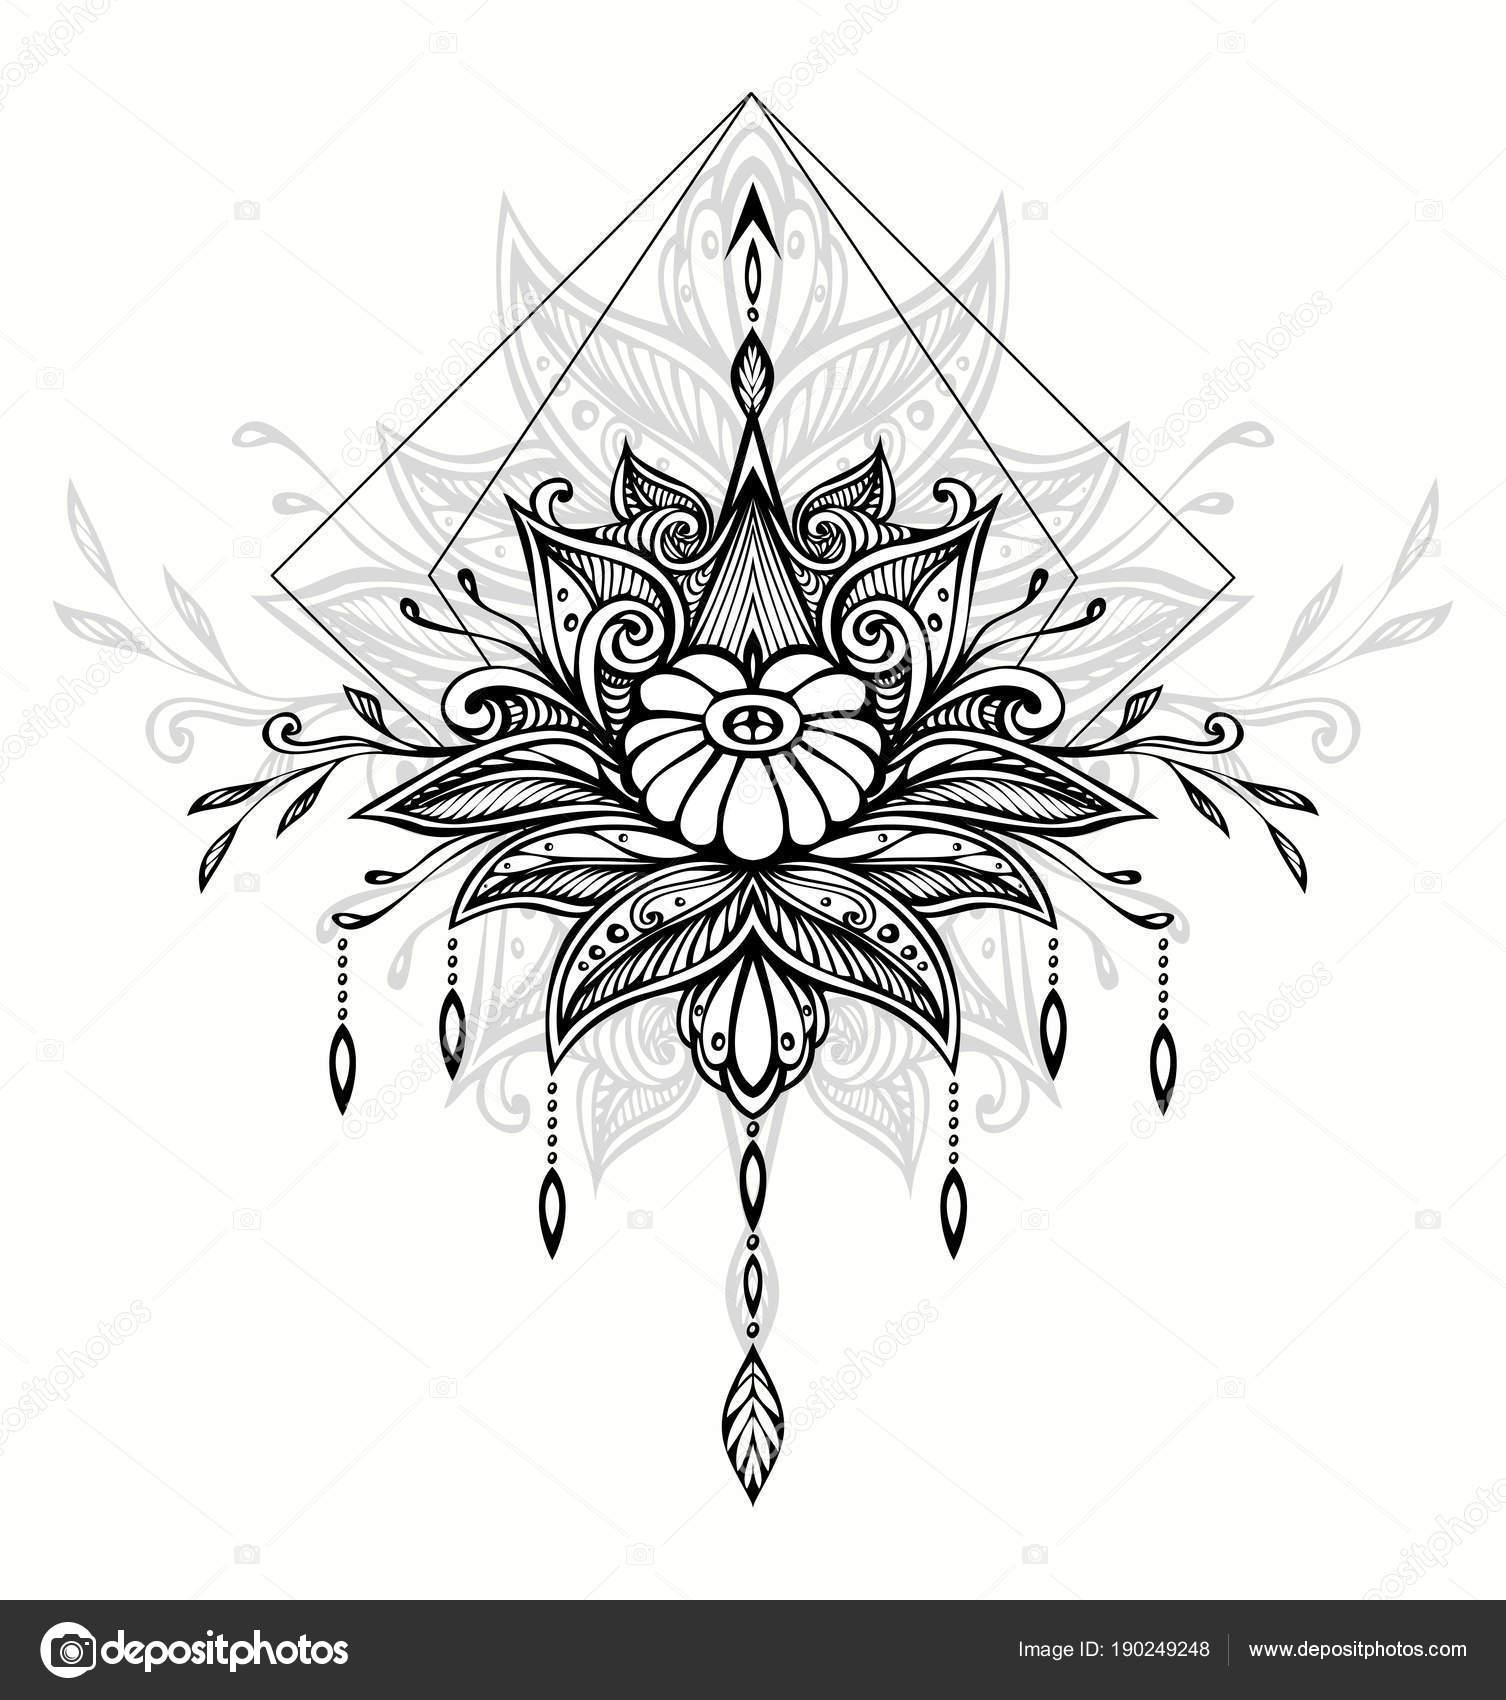 Resumen Maraña Zen Zen Doodle Símbolo Estilo Boho Indio Asiático ...